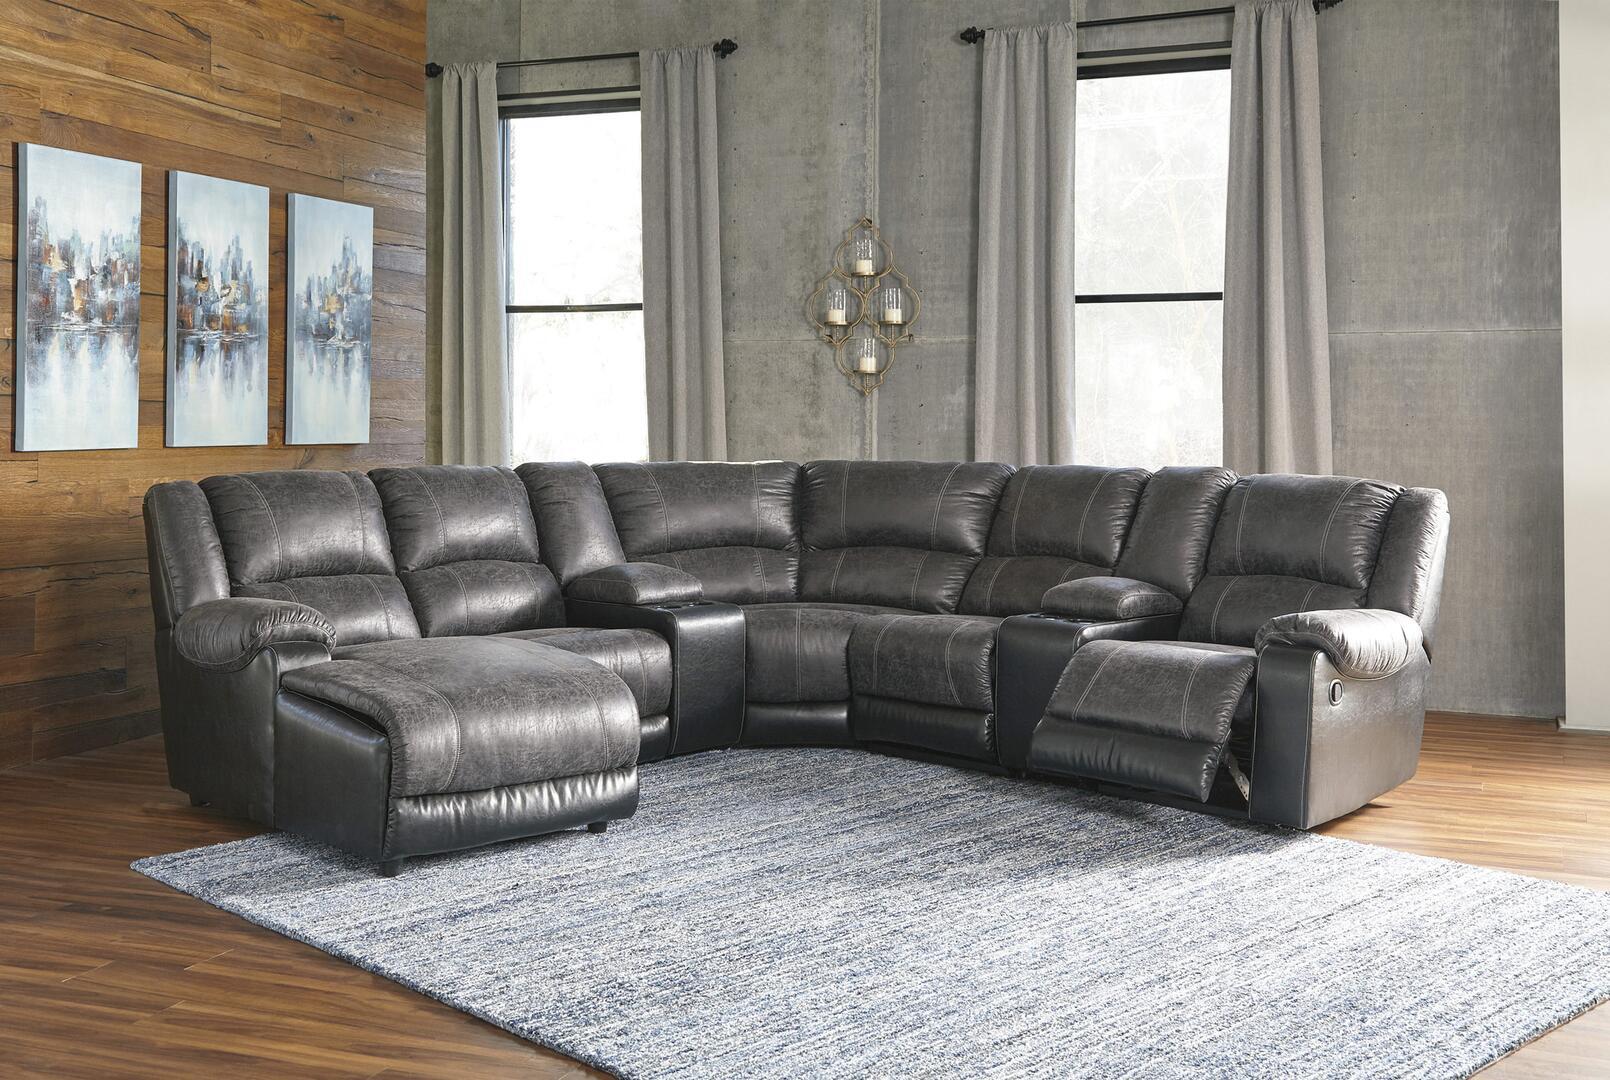 milo corner sofa groupon review fairmont avalon italia mi215416574677195741slat felicity series